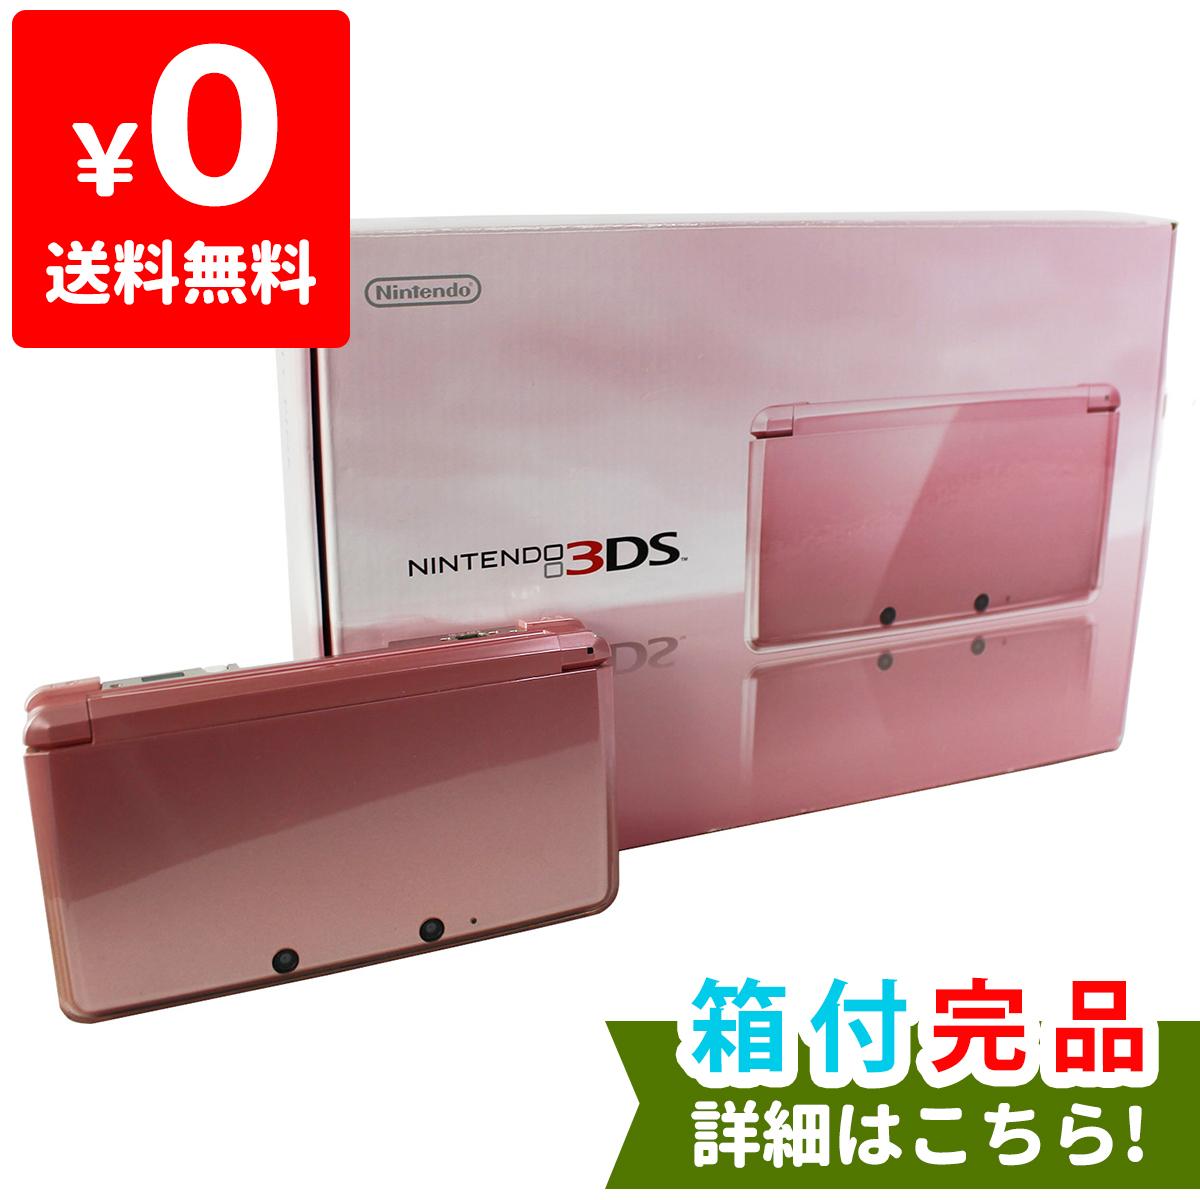 3DS ニンテンドー3DS ミスティピンクCTR-S-PAAA 本体 完品 外箱付き Nintendo 任天堂 ニンテンドー 中古 4902370519129 送料無料 【中古】